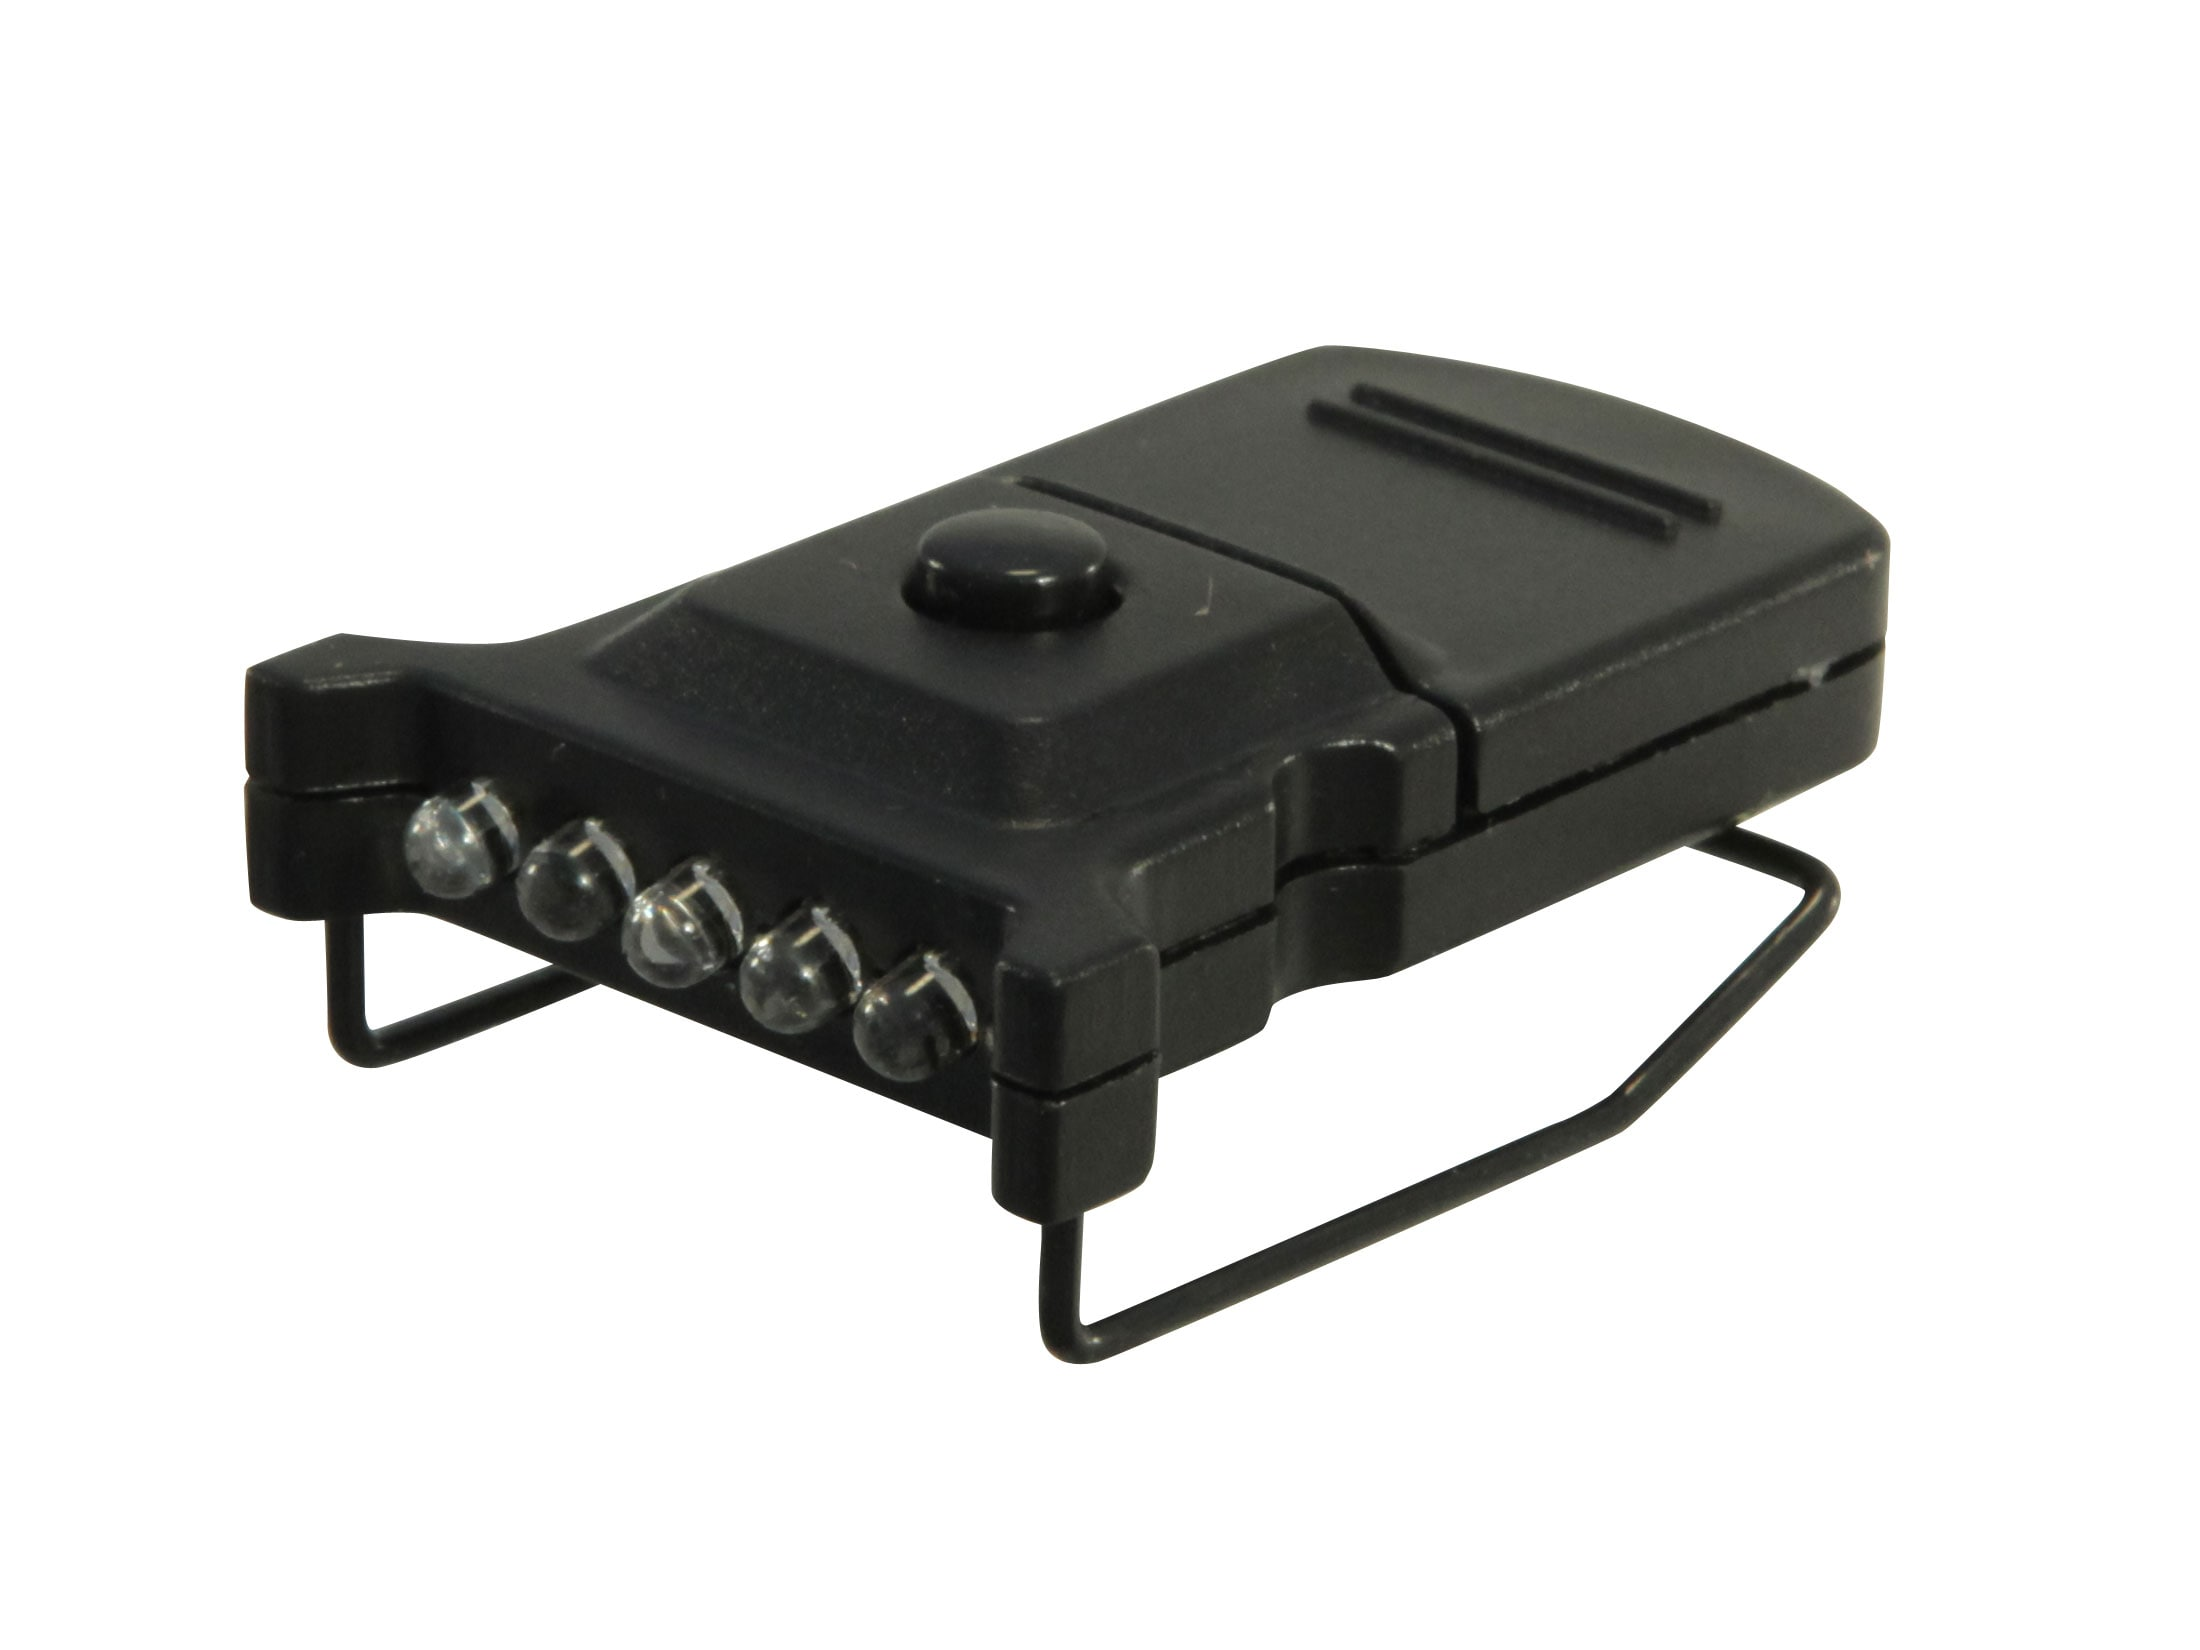 Cyclops HATCLIP LIGHTS CYC-MHC-G Headlamp